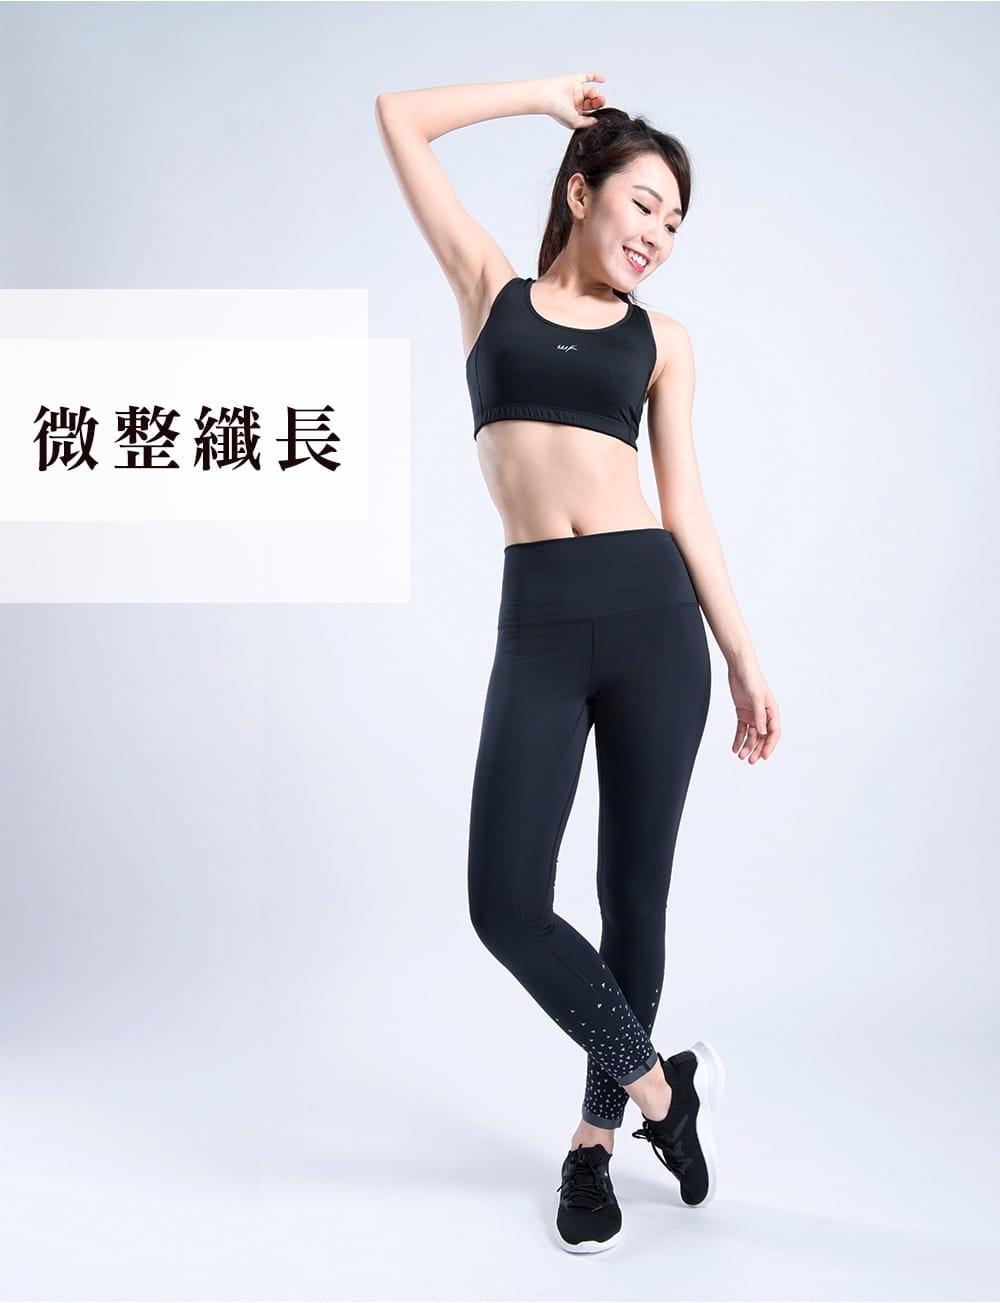 【WISENFIT】台灣製- 高腰束腹緊身褲 3